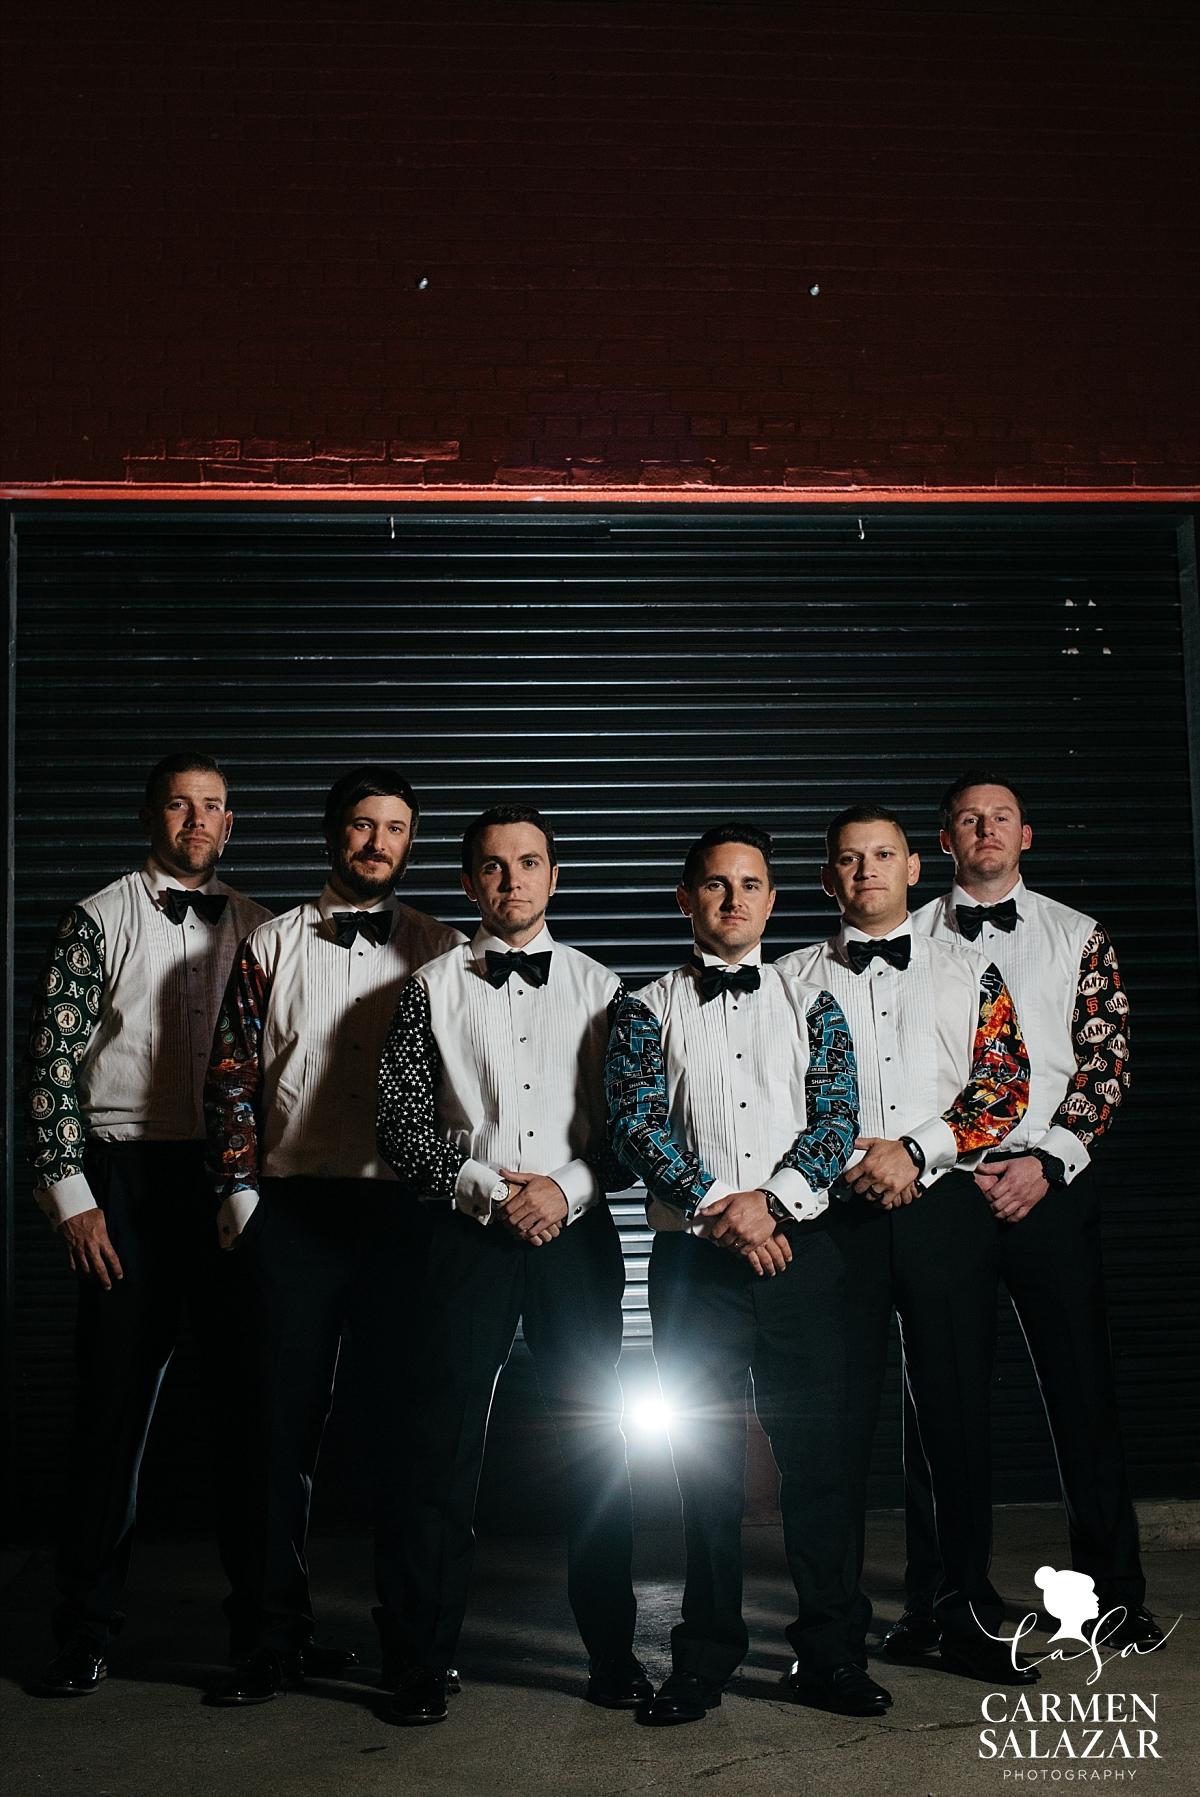 Personalized sports team wedding tuxedo shirts - Carmen Salazar